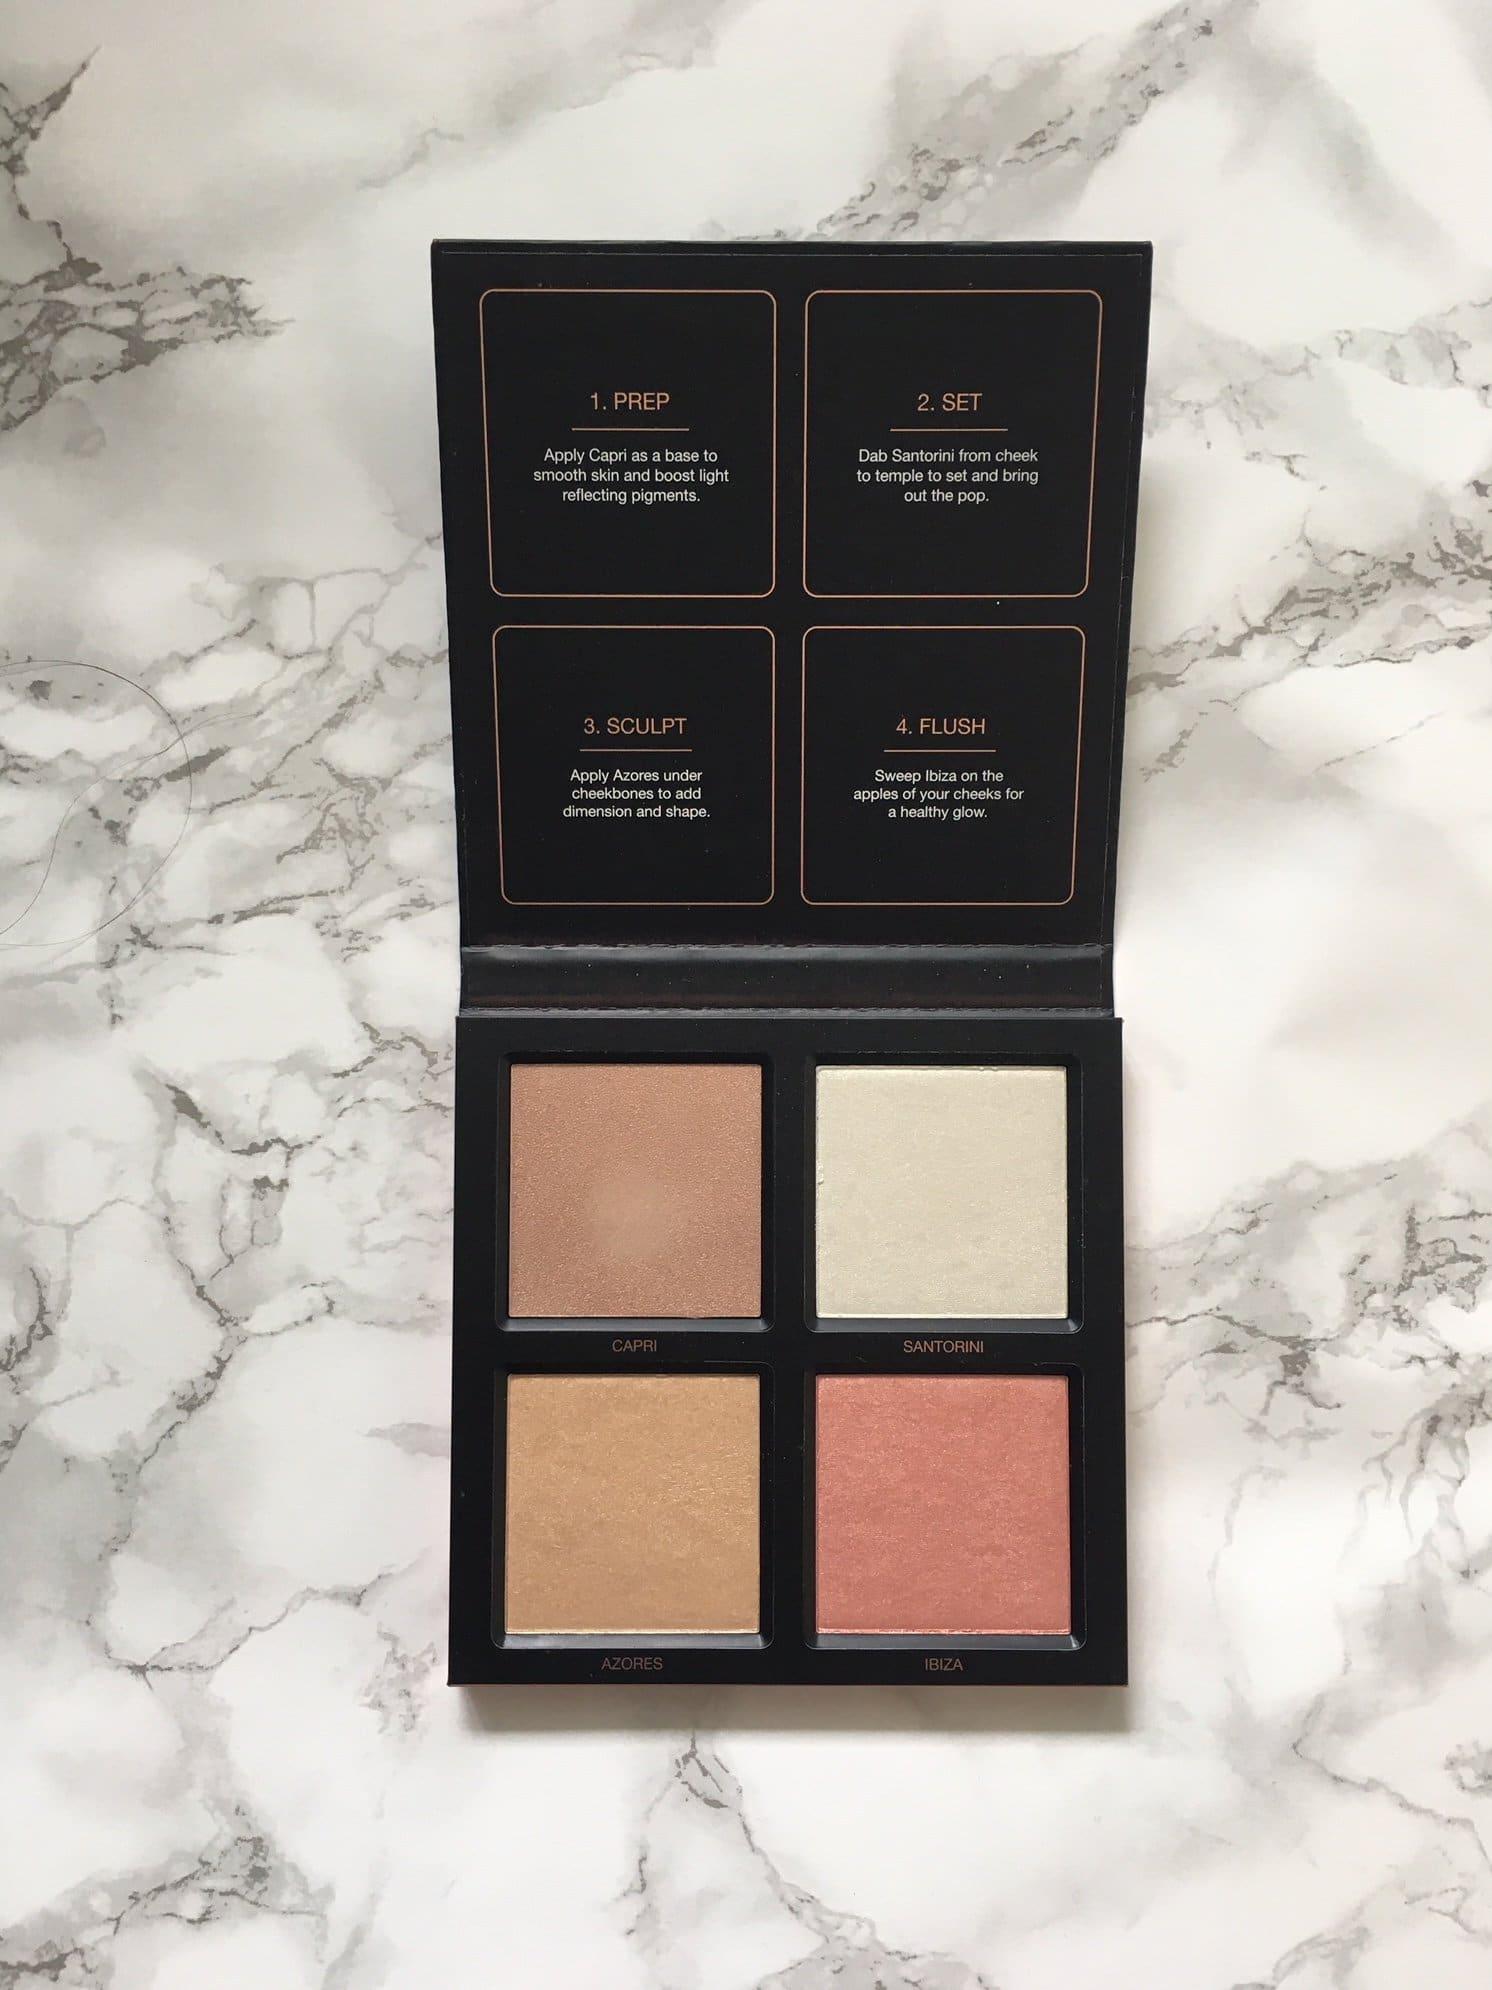 Huda Beauty Highlighter Palette & Eyeshadow Palette | Review 3